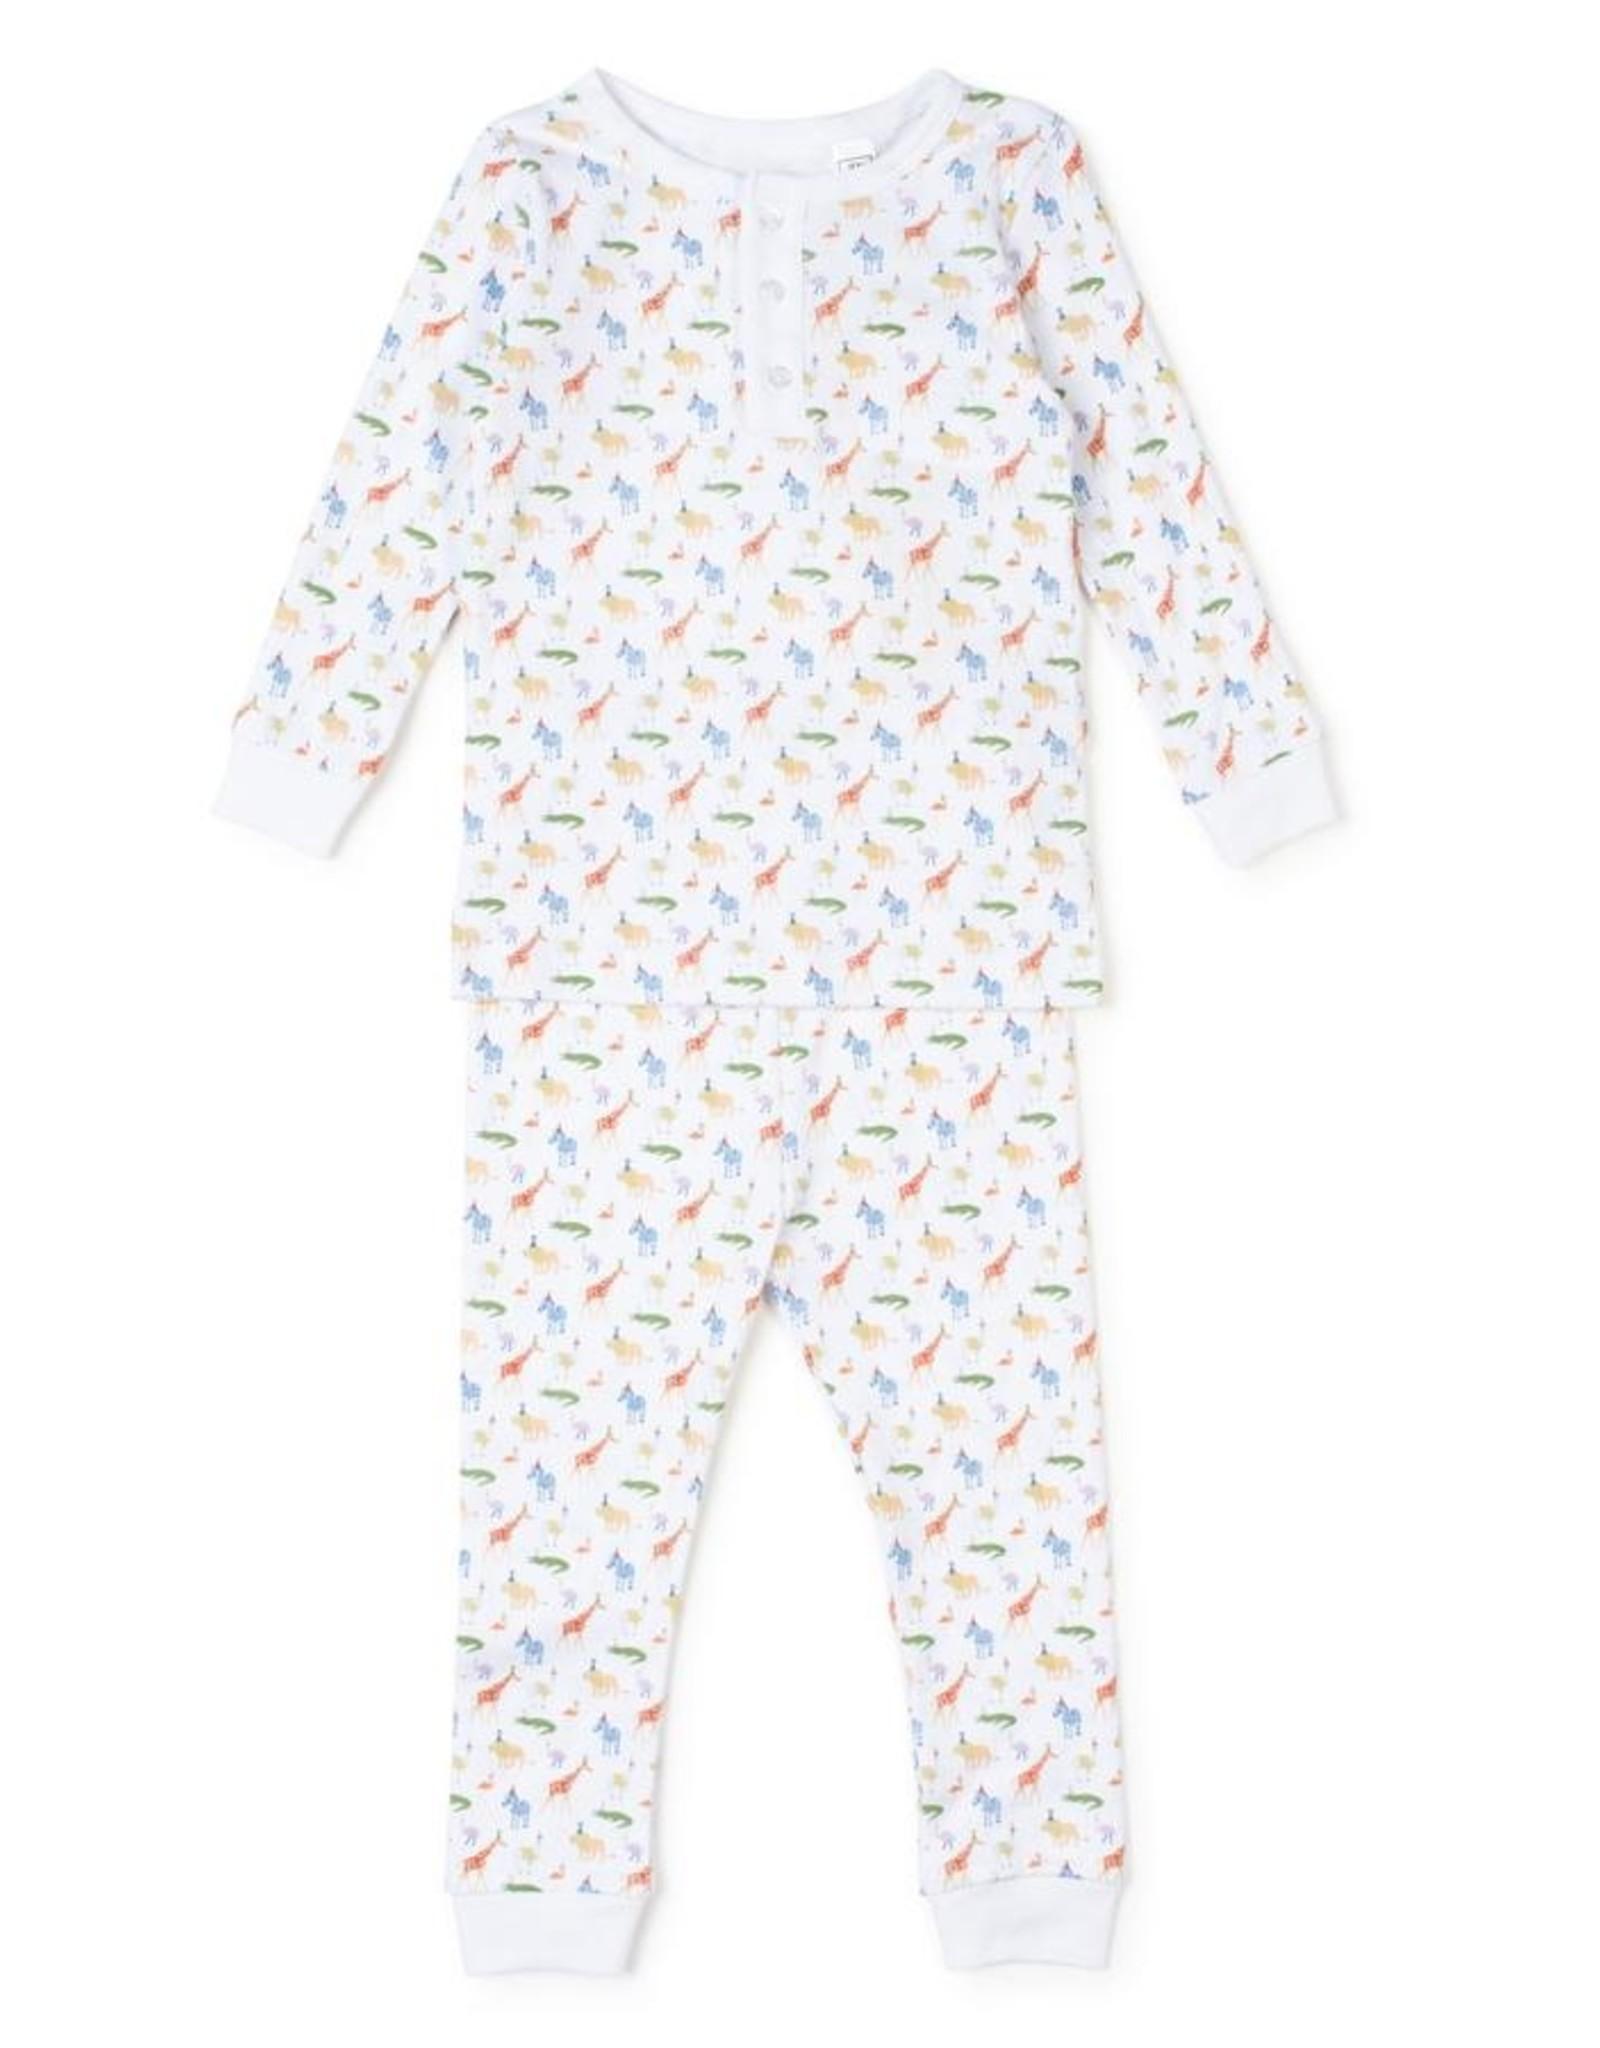 Lila and Hayes Jack Pajama Set Party Animals